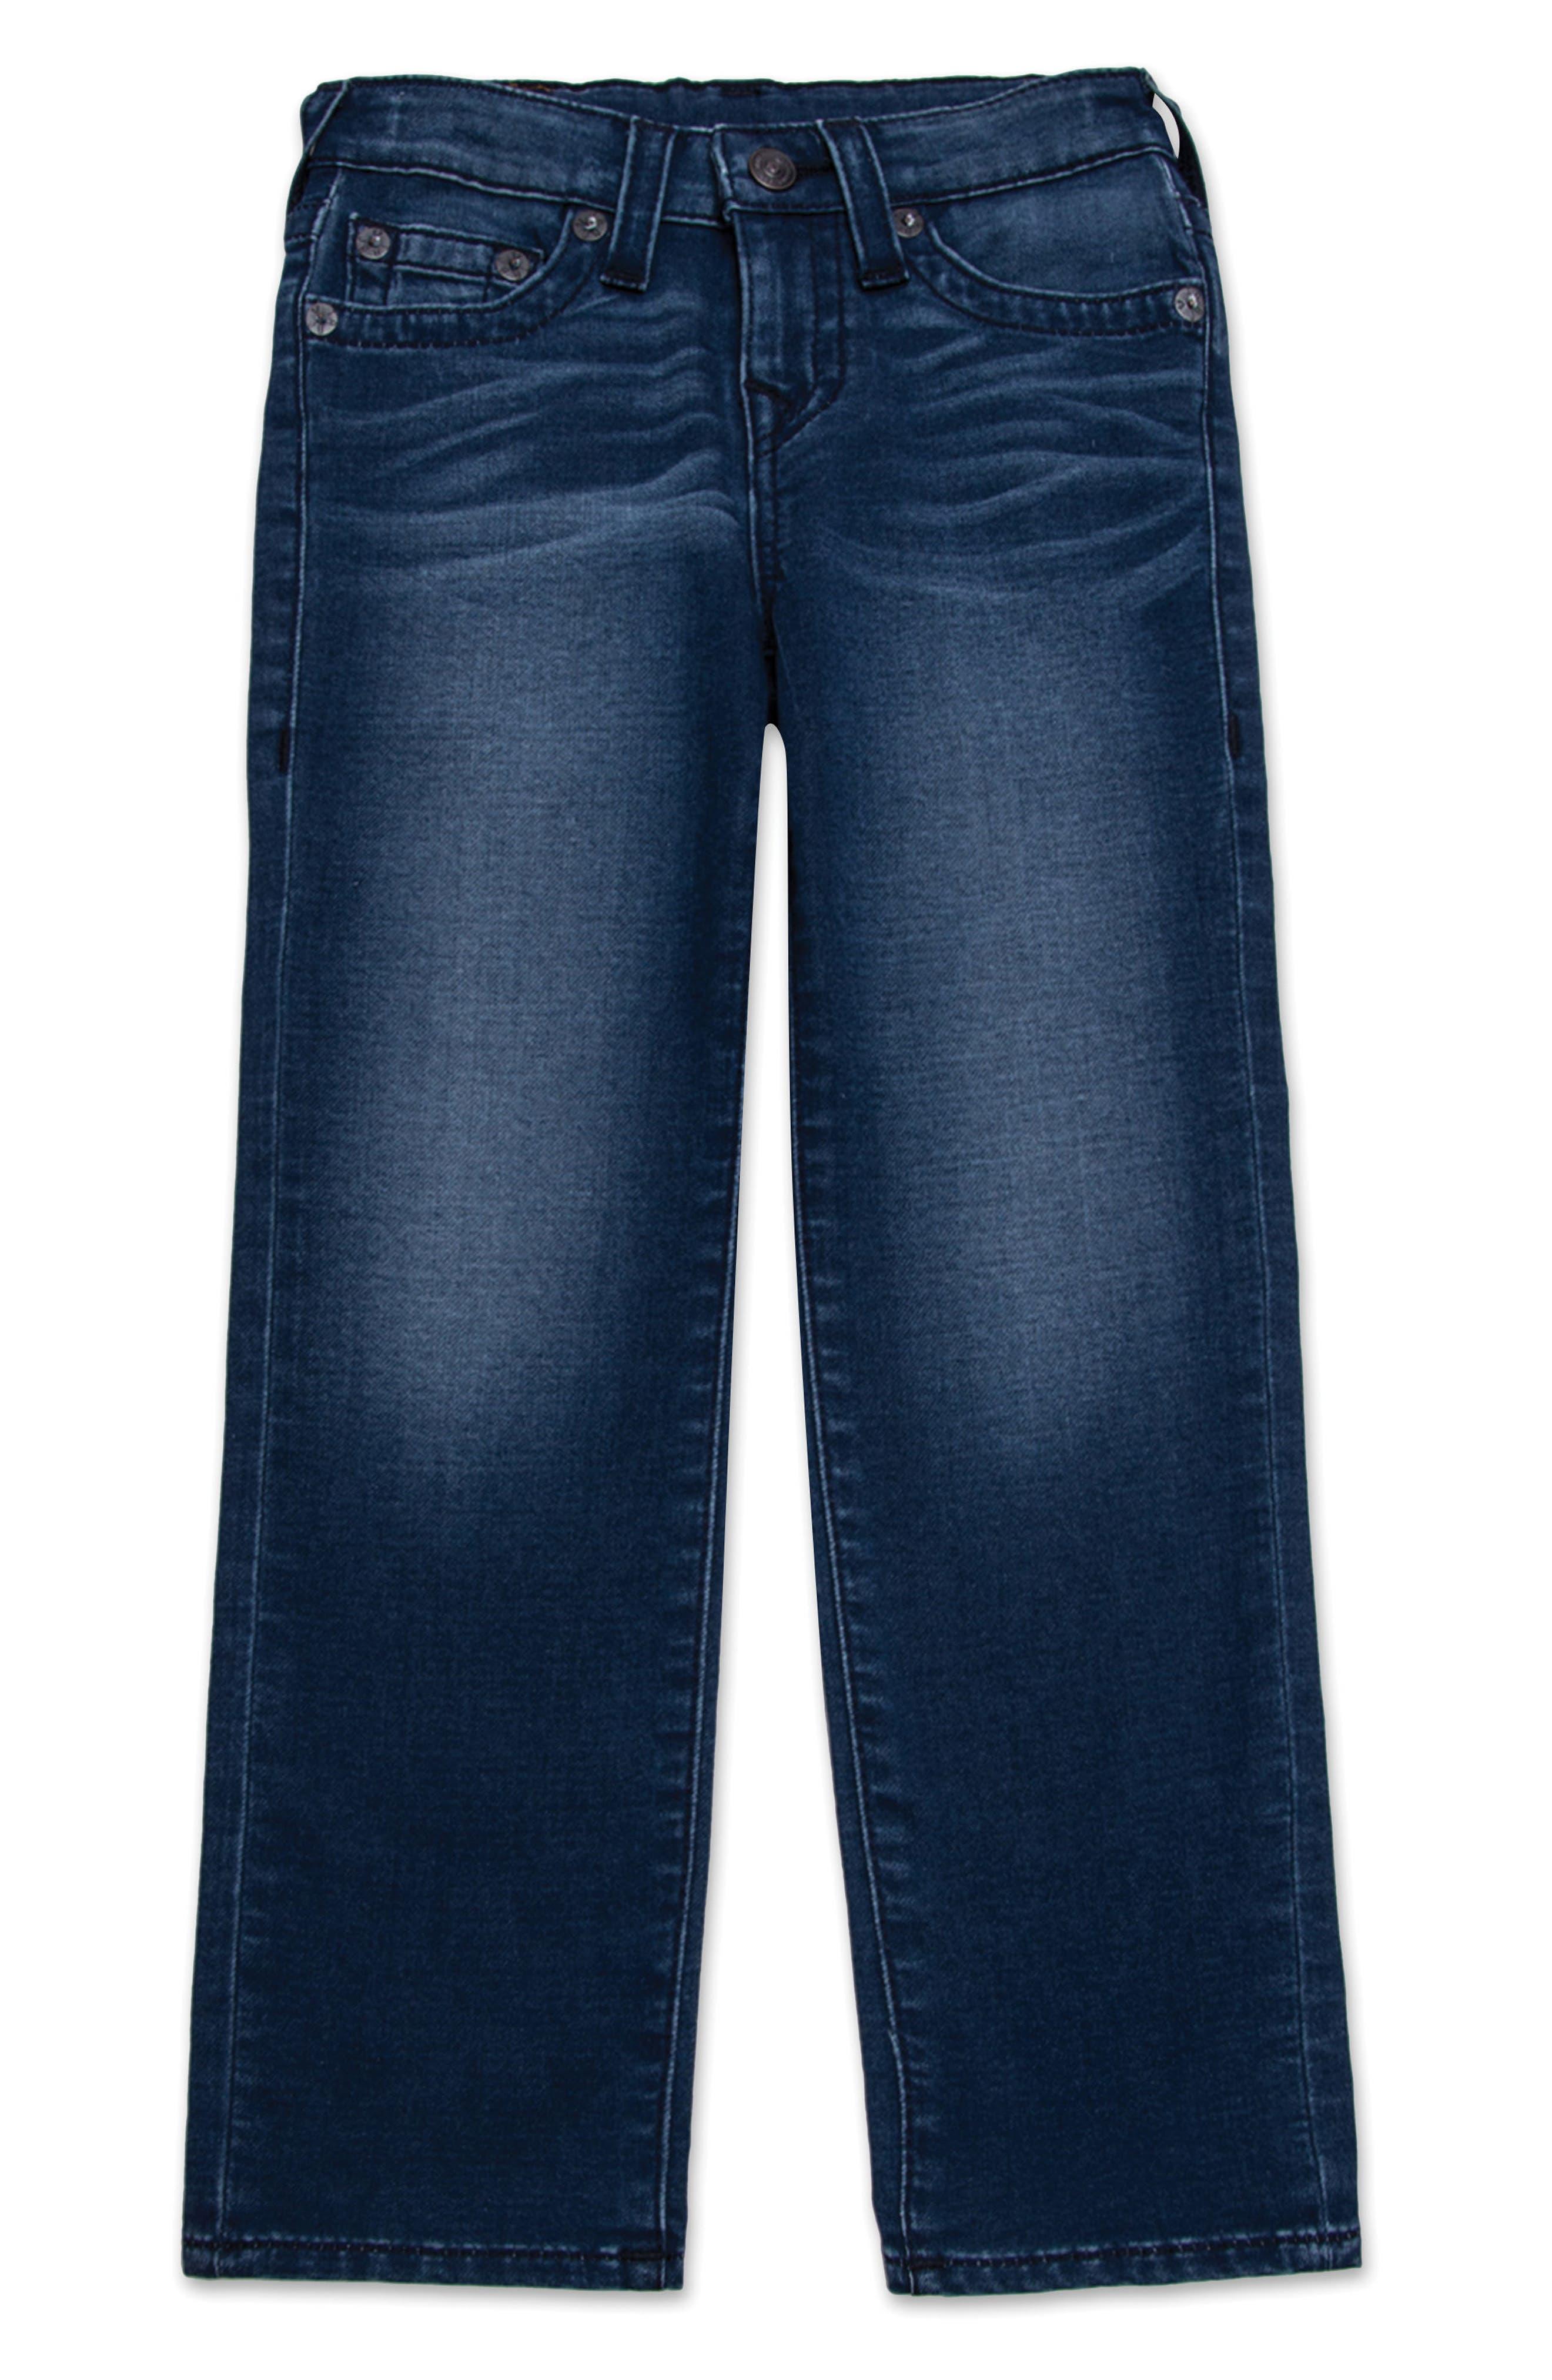 Geno Single End Straight Leg Jeans,                         Main,                         color, Avant Wash